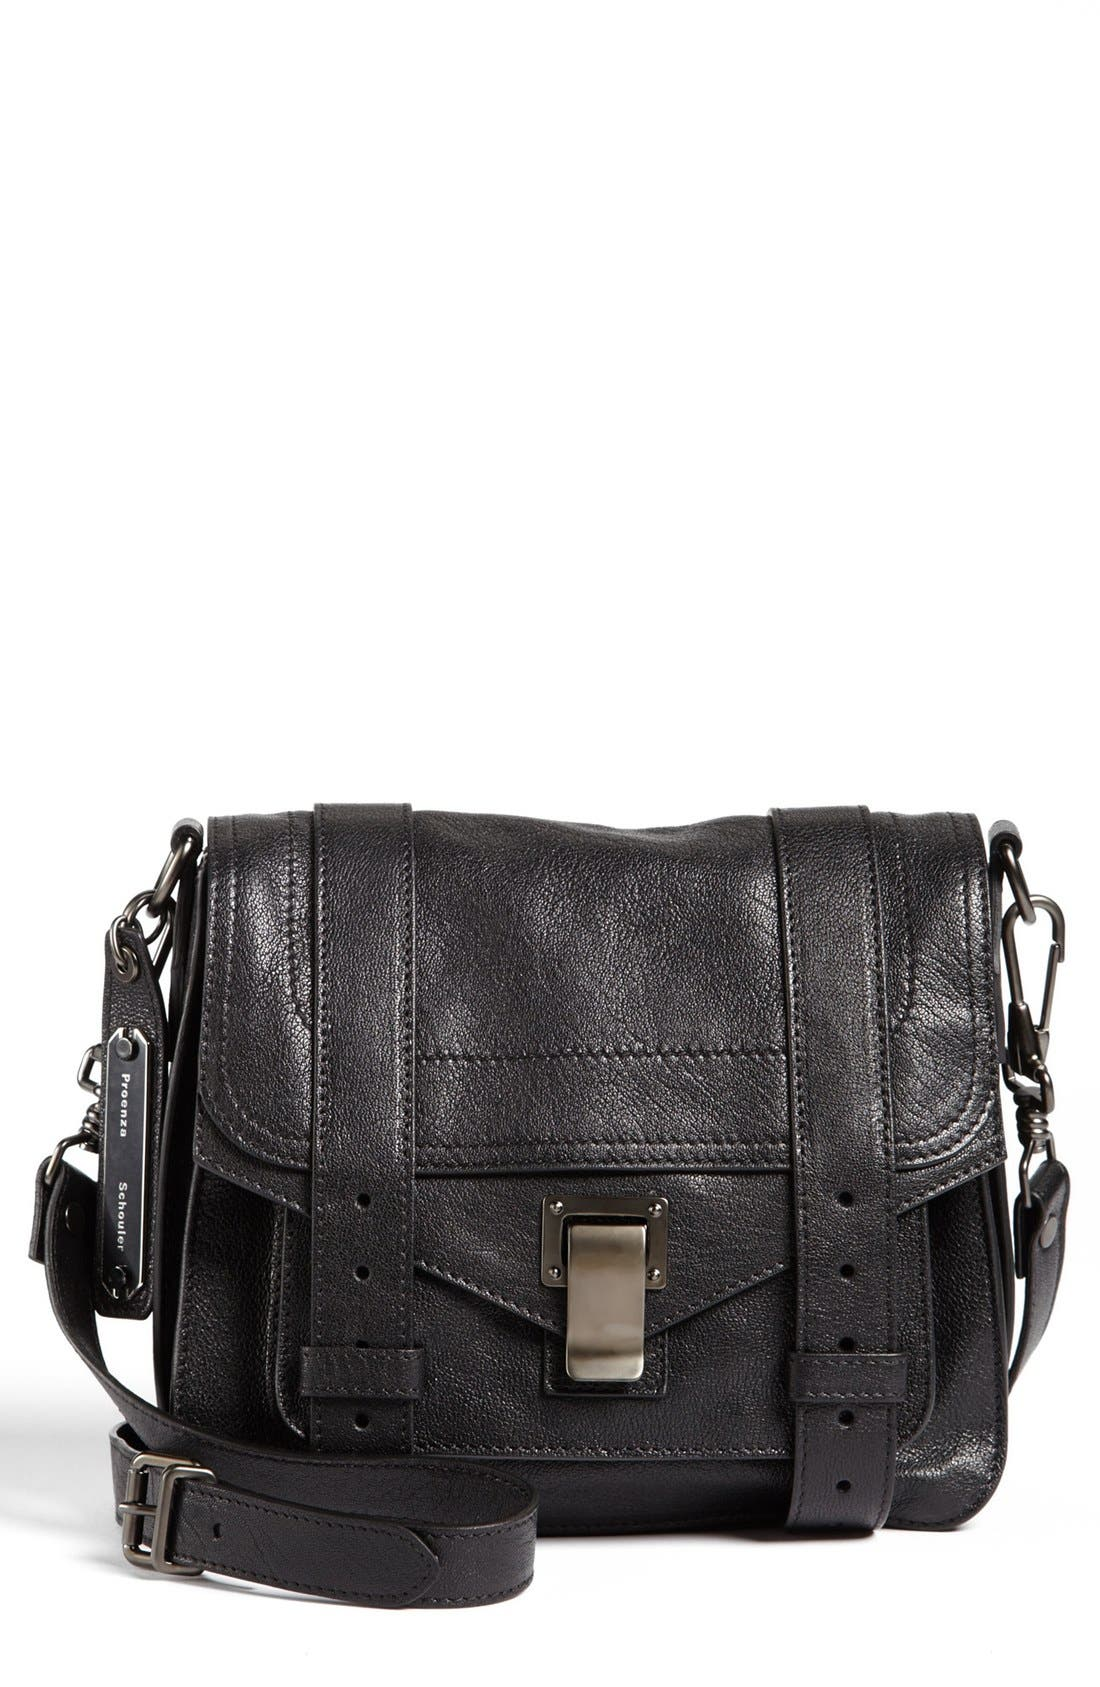 Main Image - Proenza Schouler 'PS1' Crossbody Bag